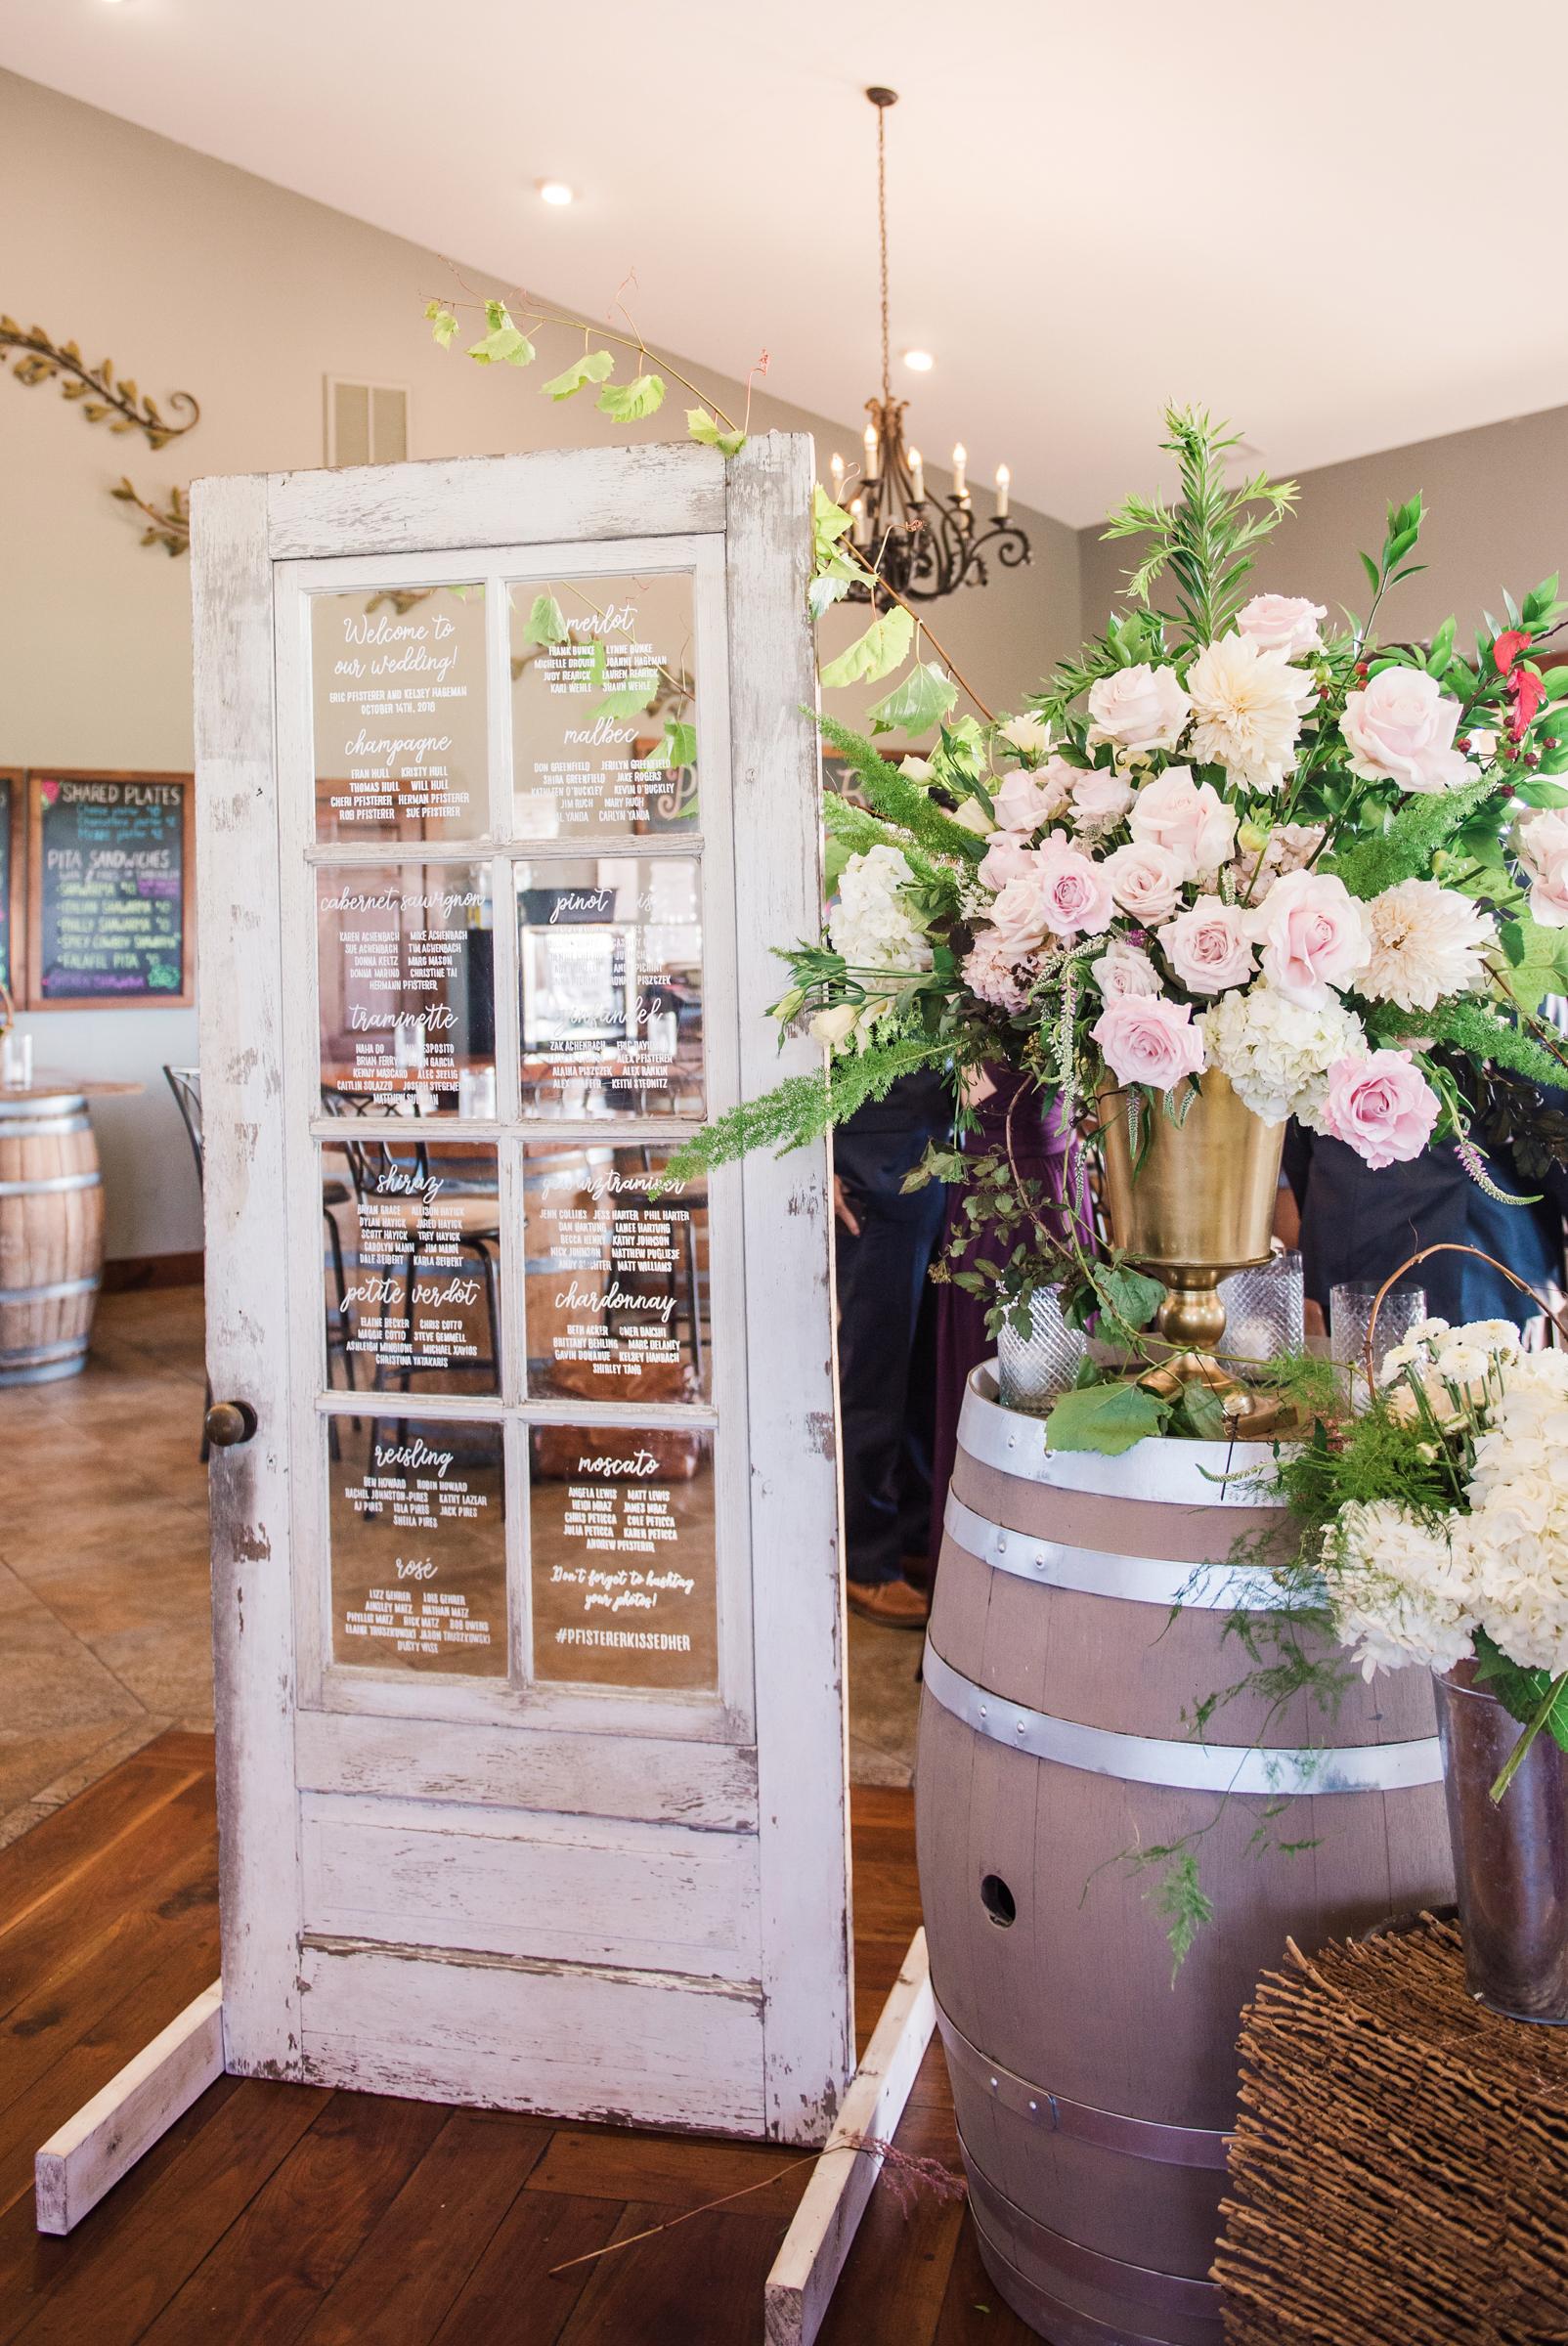 Zugibe_Vineyards_Finger_Lakes_Wedding_JILL_STUDIO_Rochester_NY_Photographer_DSC_3886.jpg